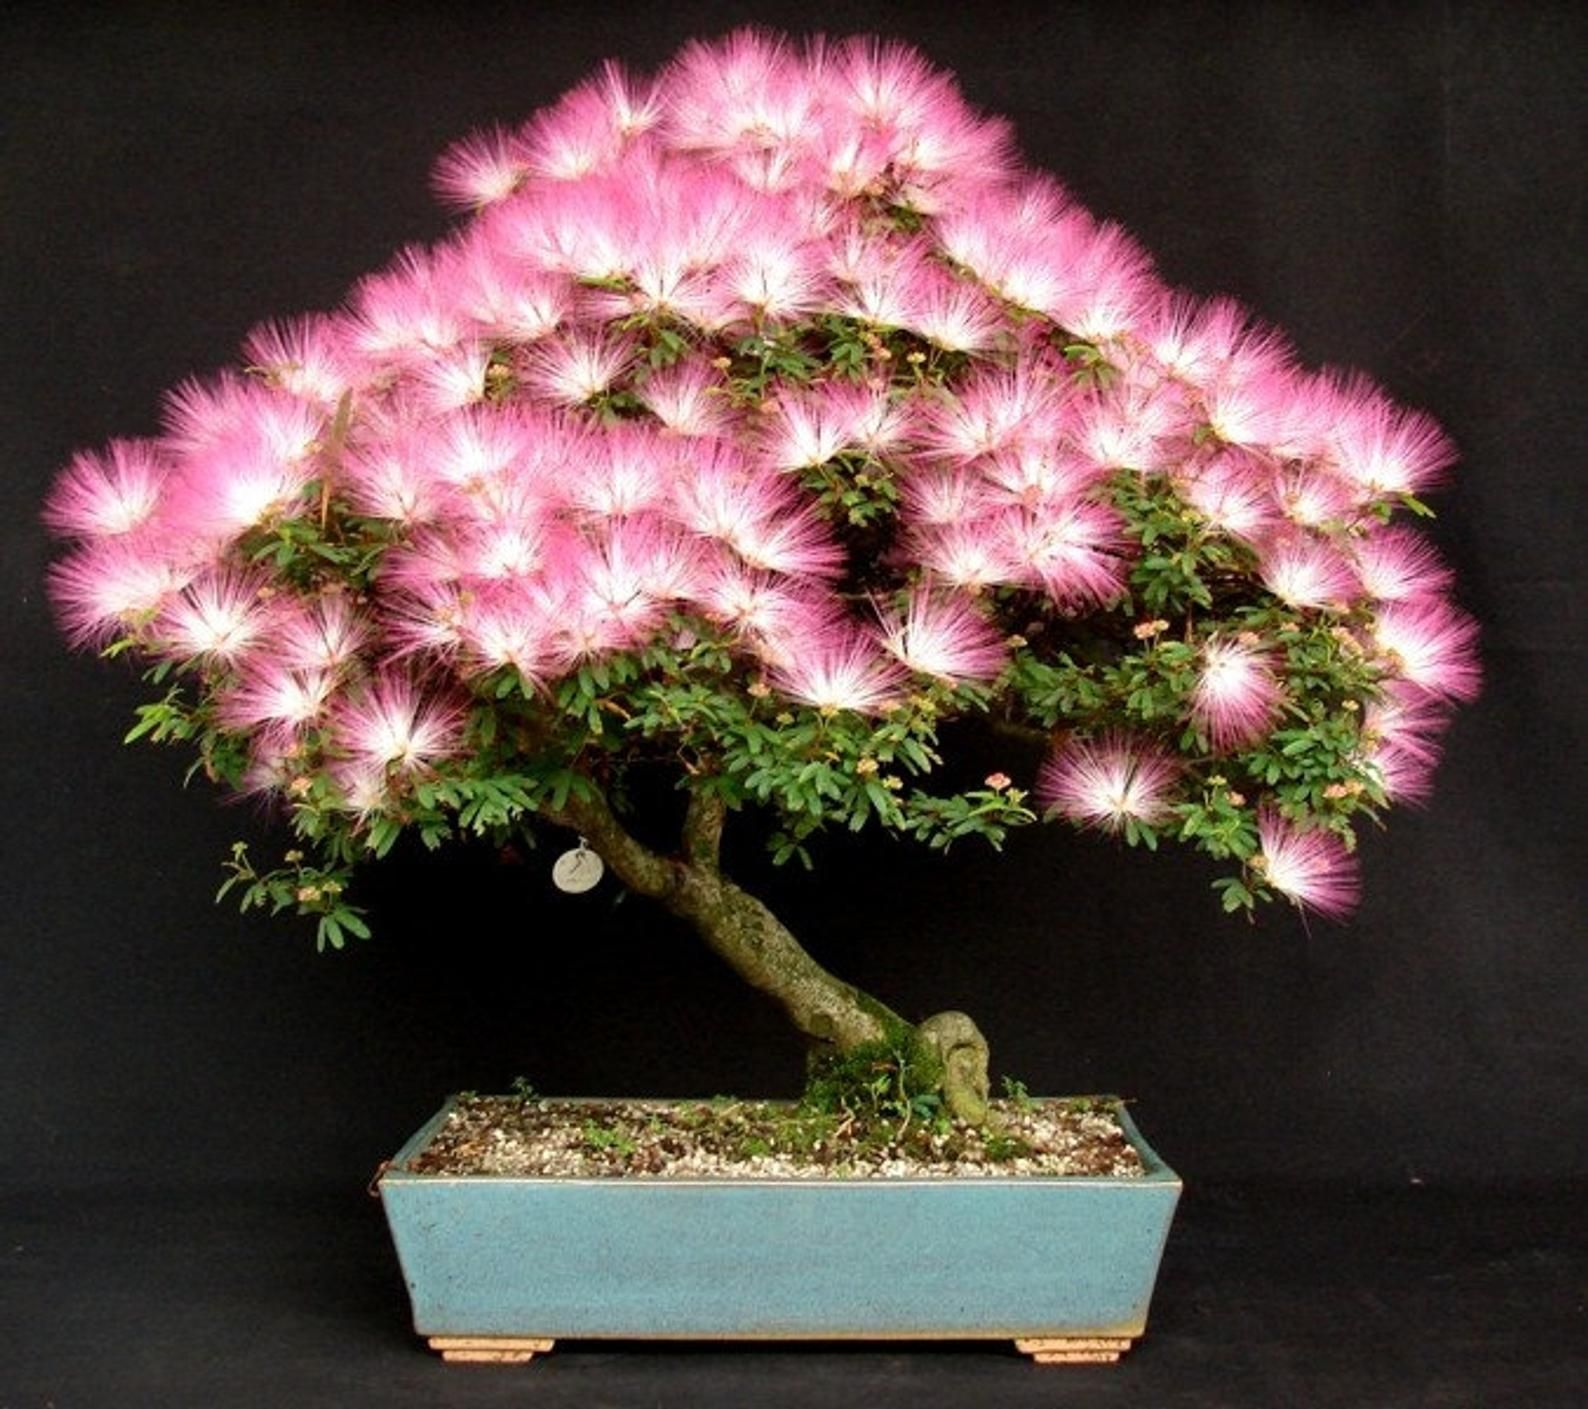 Albizia Julibrissin Mimosa Bonsai Pink Tree 10 Seeds Rare In 2021 Mimosa Tree Bonsai Trees For Sale Silk Tree